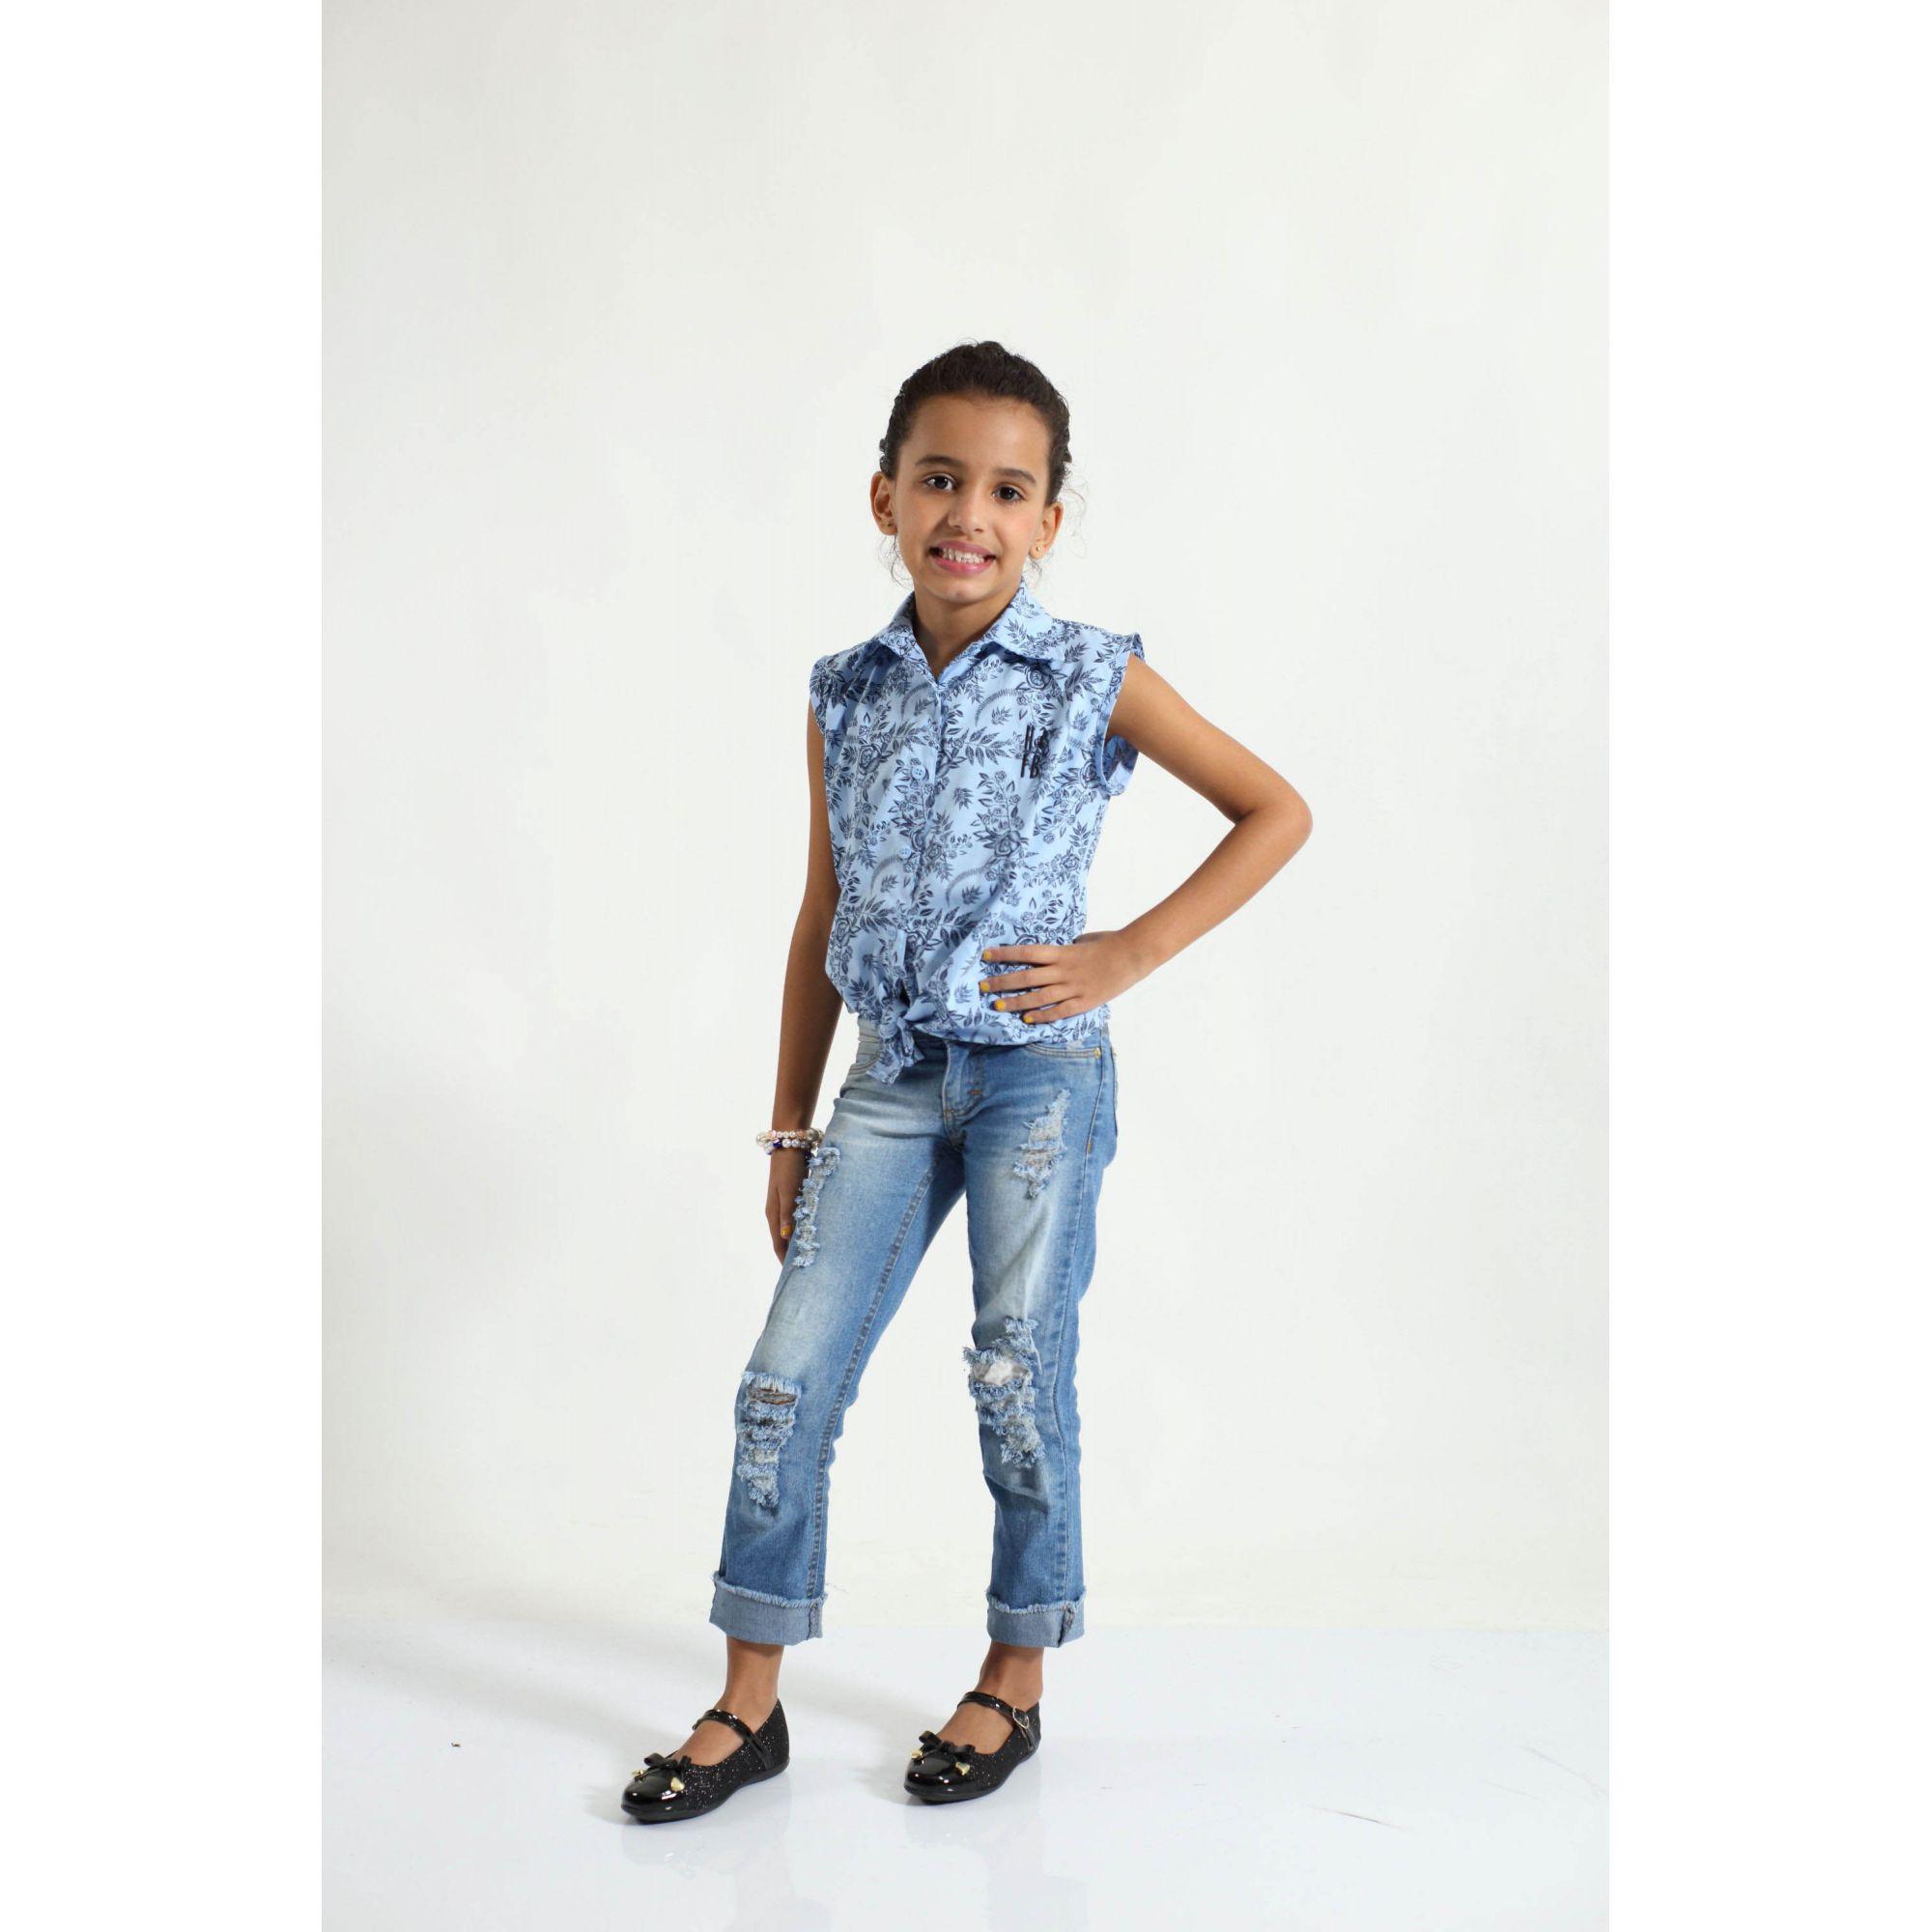 PAI E FILHA > Kit 02 Camisas Manga Curta Azul Floral  [Coleção Tal Pai Tal Filha]  - Heitor Fashion Brazil